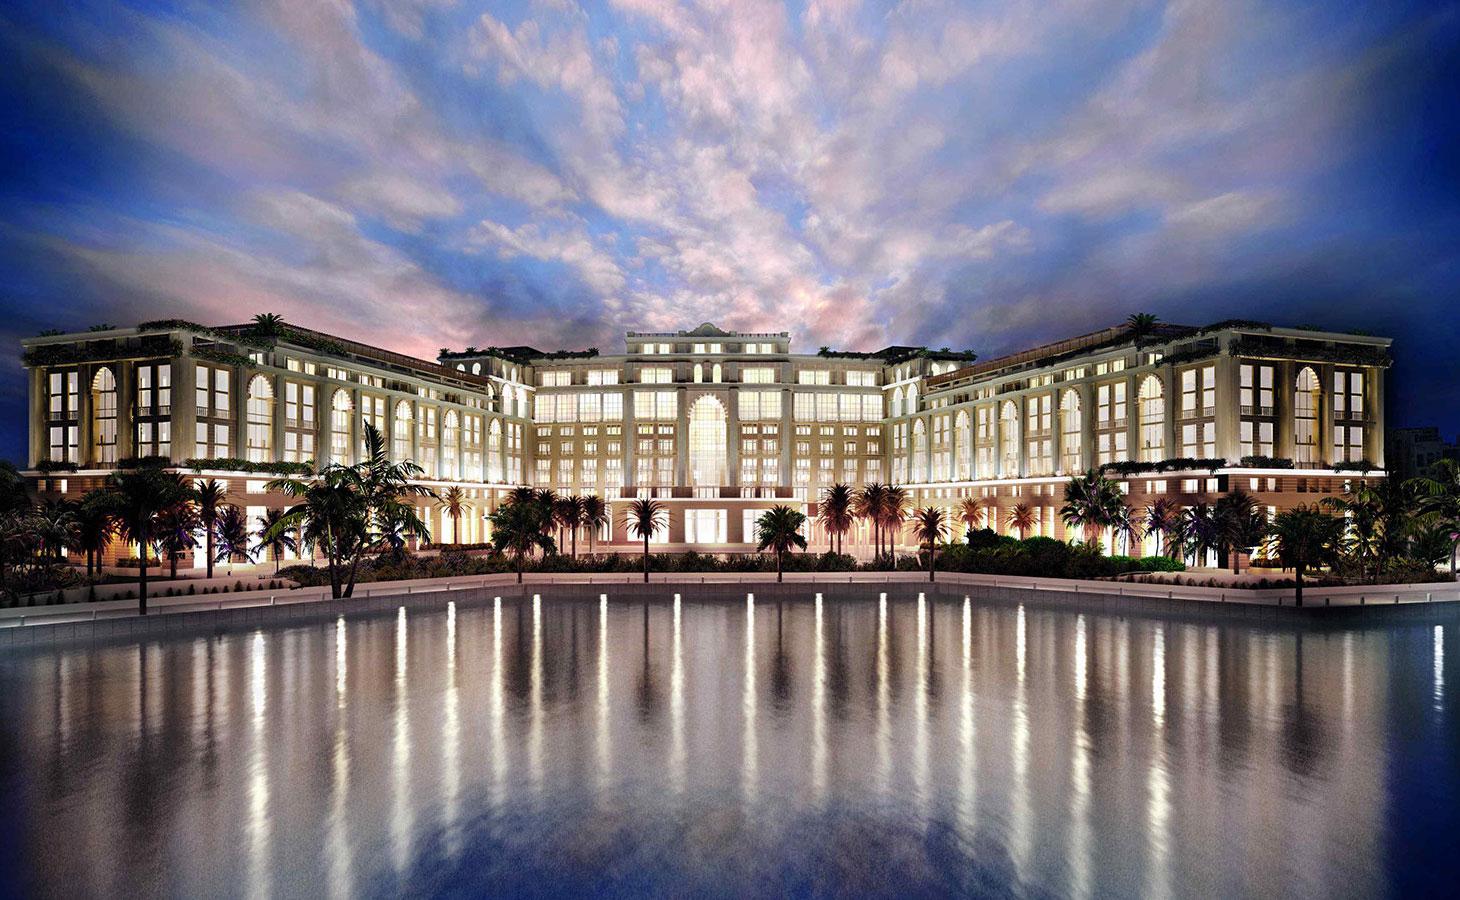 Versace opens 5-star hotel in Dubai Versace Versace opens 5-star hotel in Dubai Versace opens 5 star hotel in Dubai 1